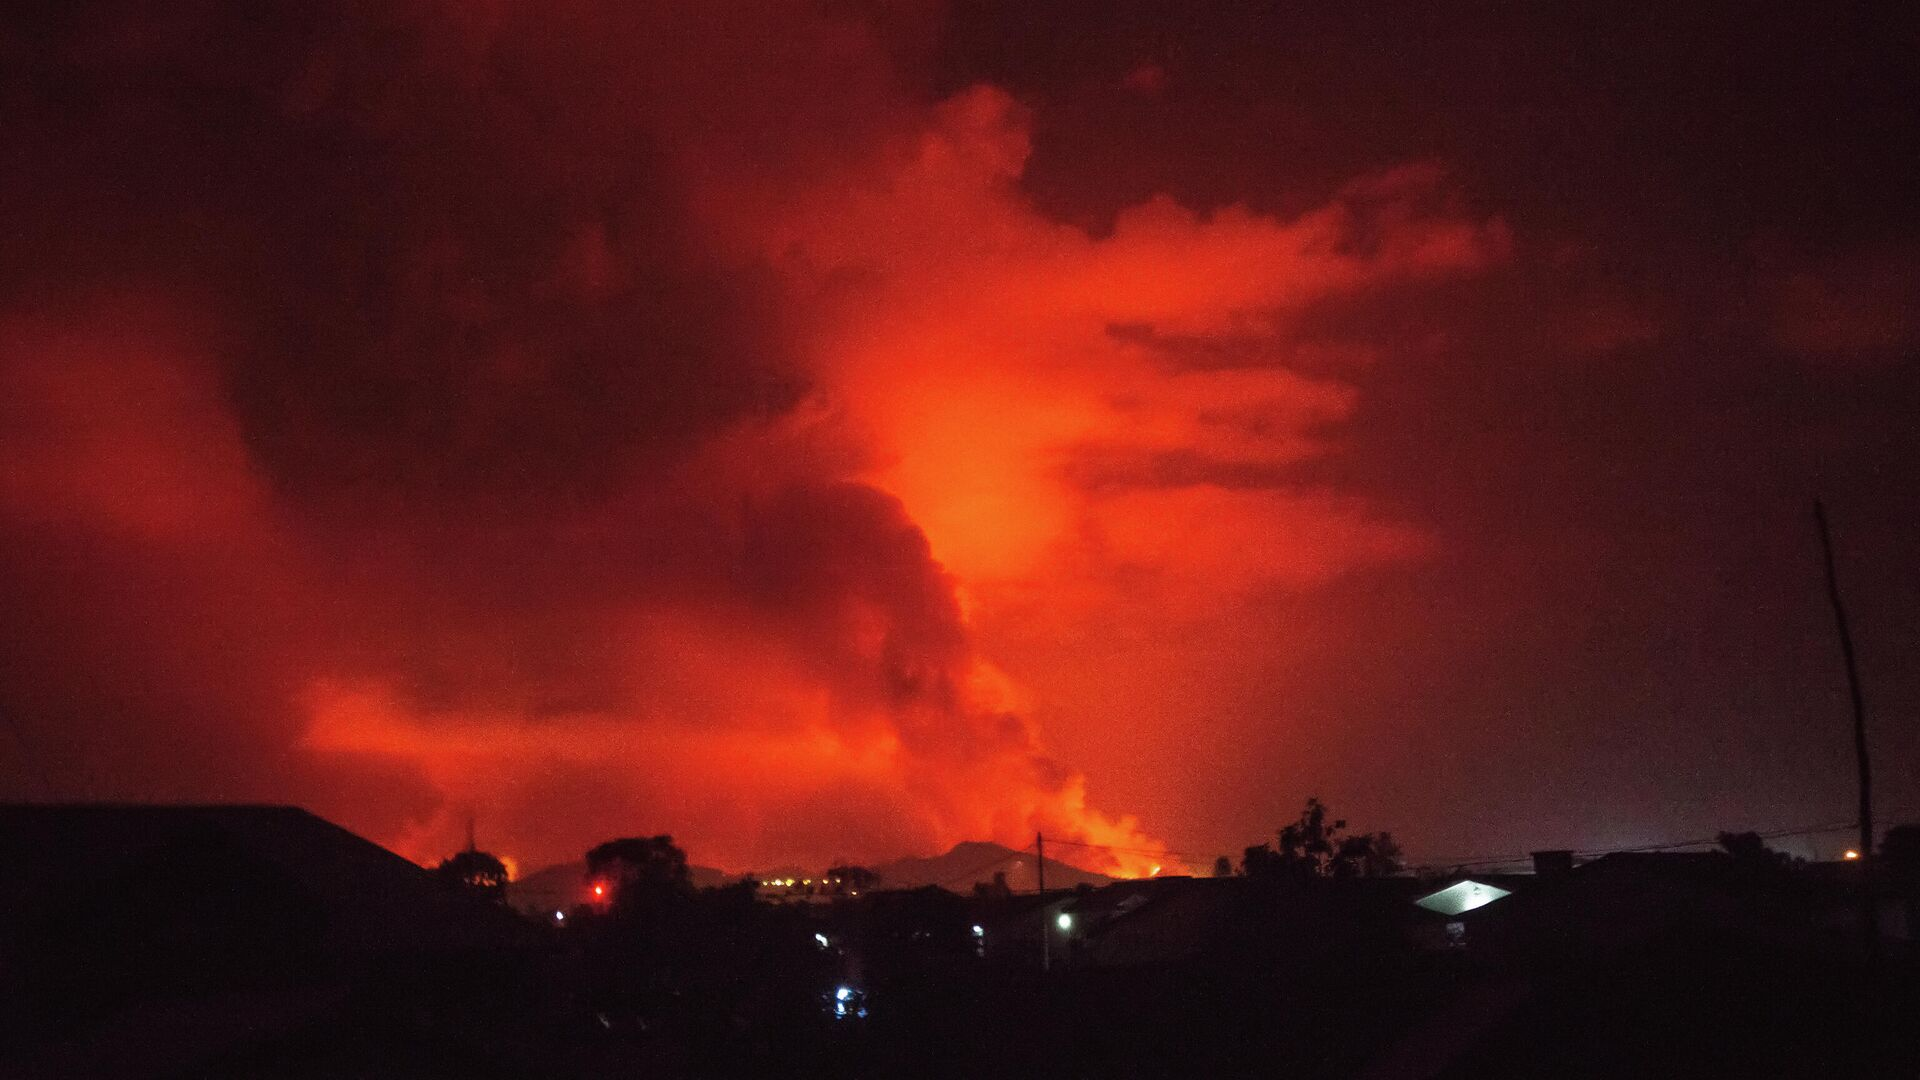 L'eruzione del vulcano Nyiragongo - Sputnik Italia, 1920, 29.05.2021